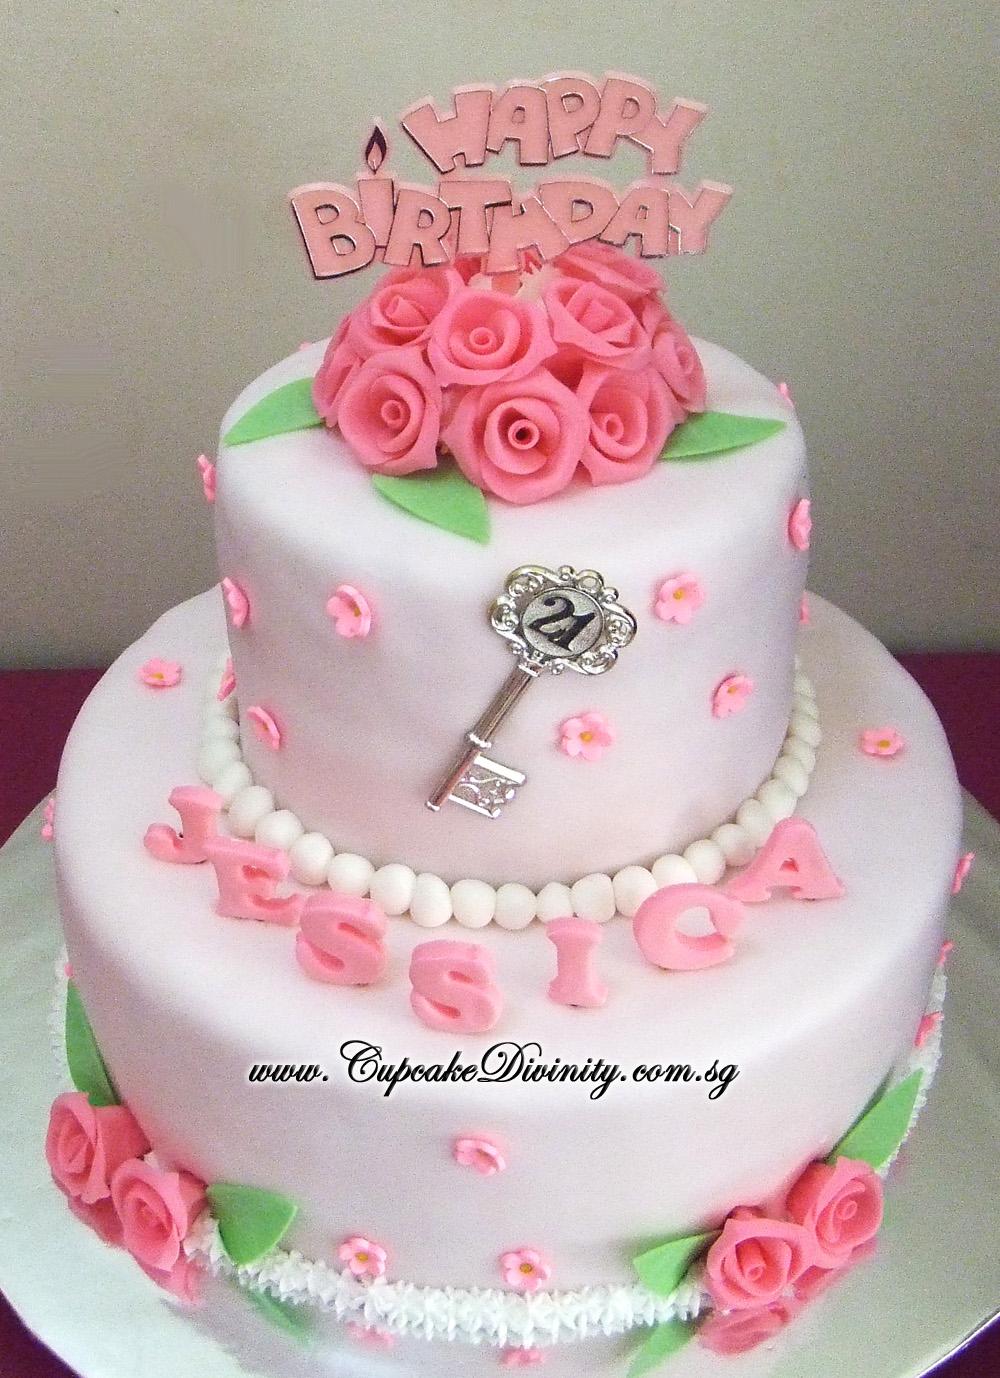 Cupcake Divinity Maxi 2 Tier Jessica 21st Birthday Fondant Cake